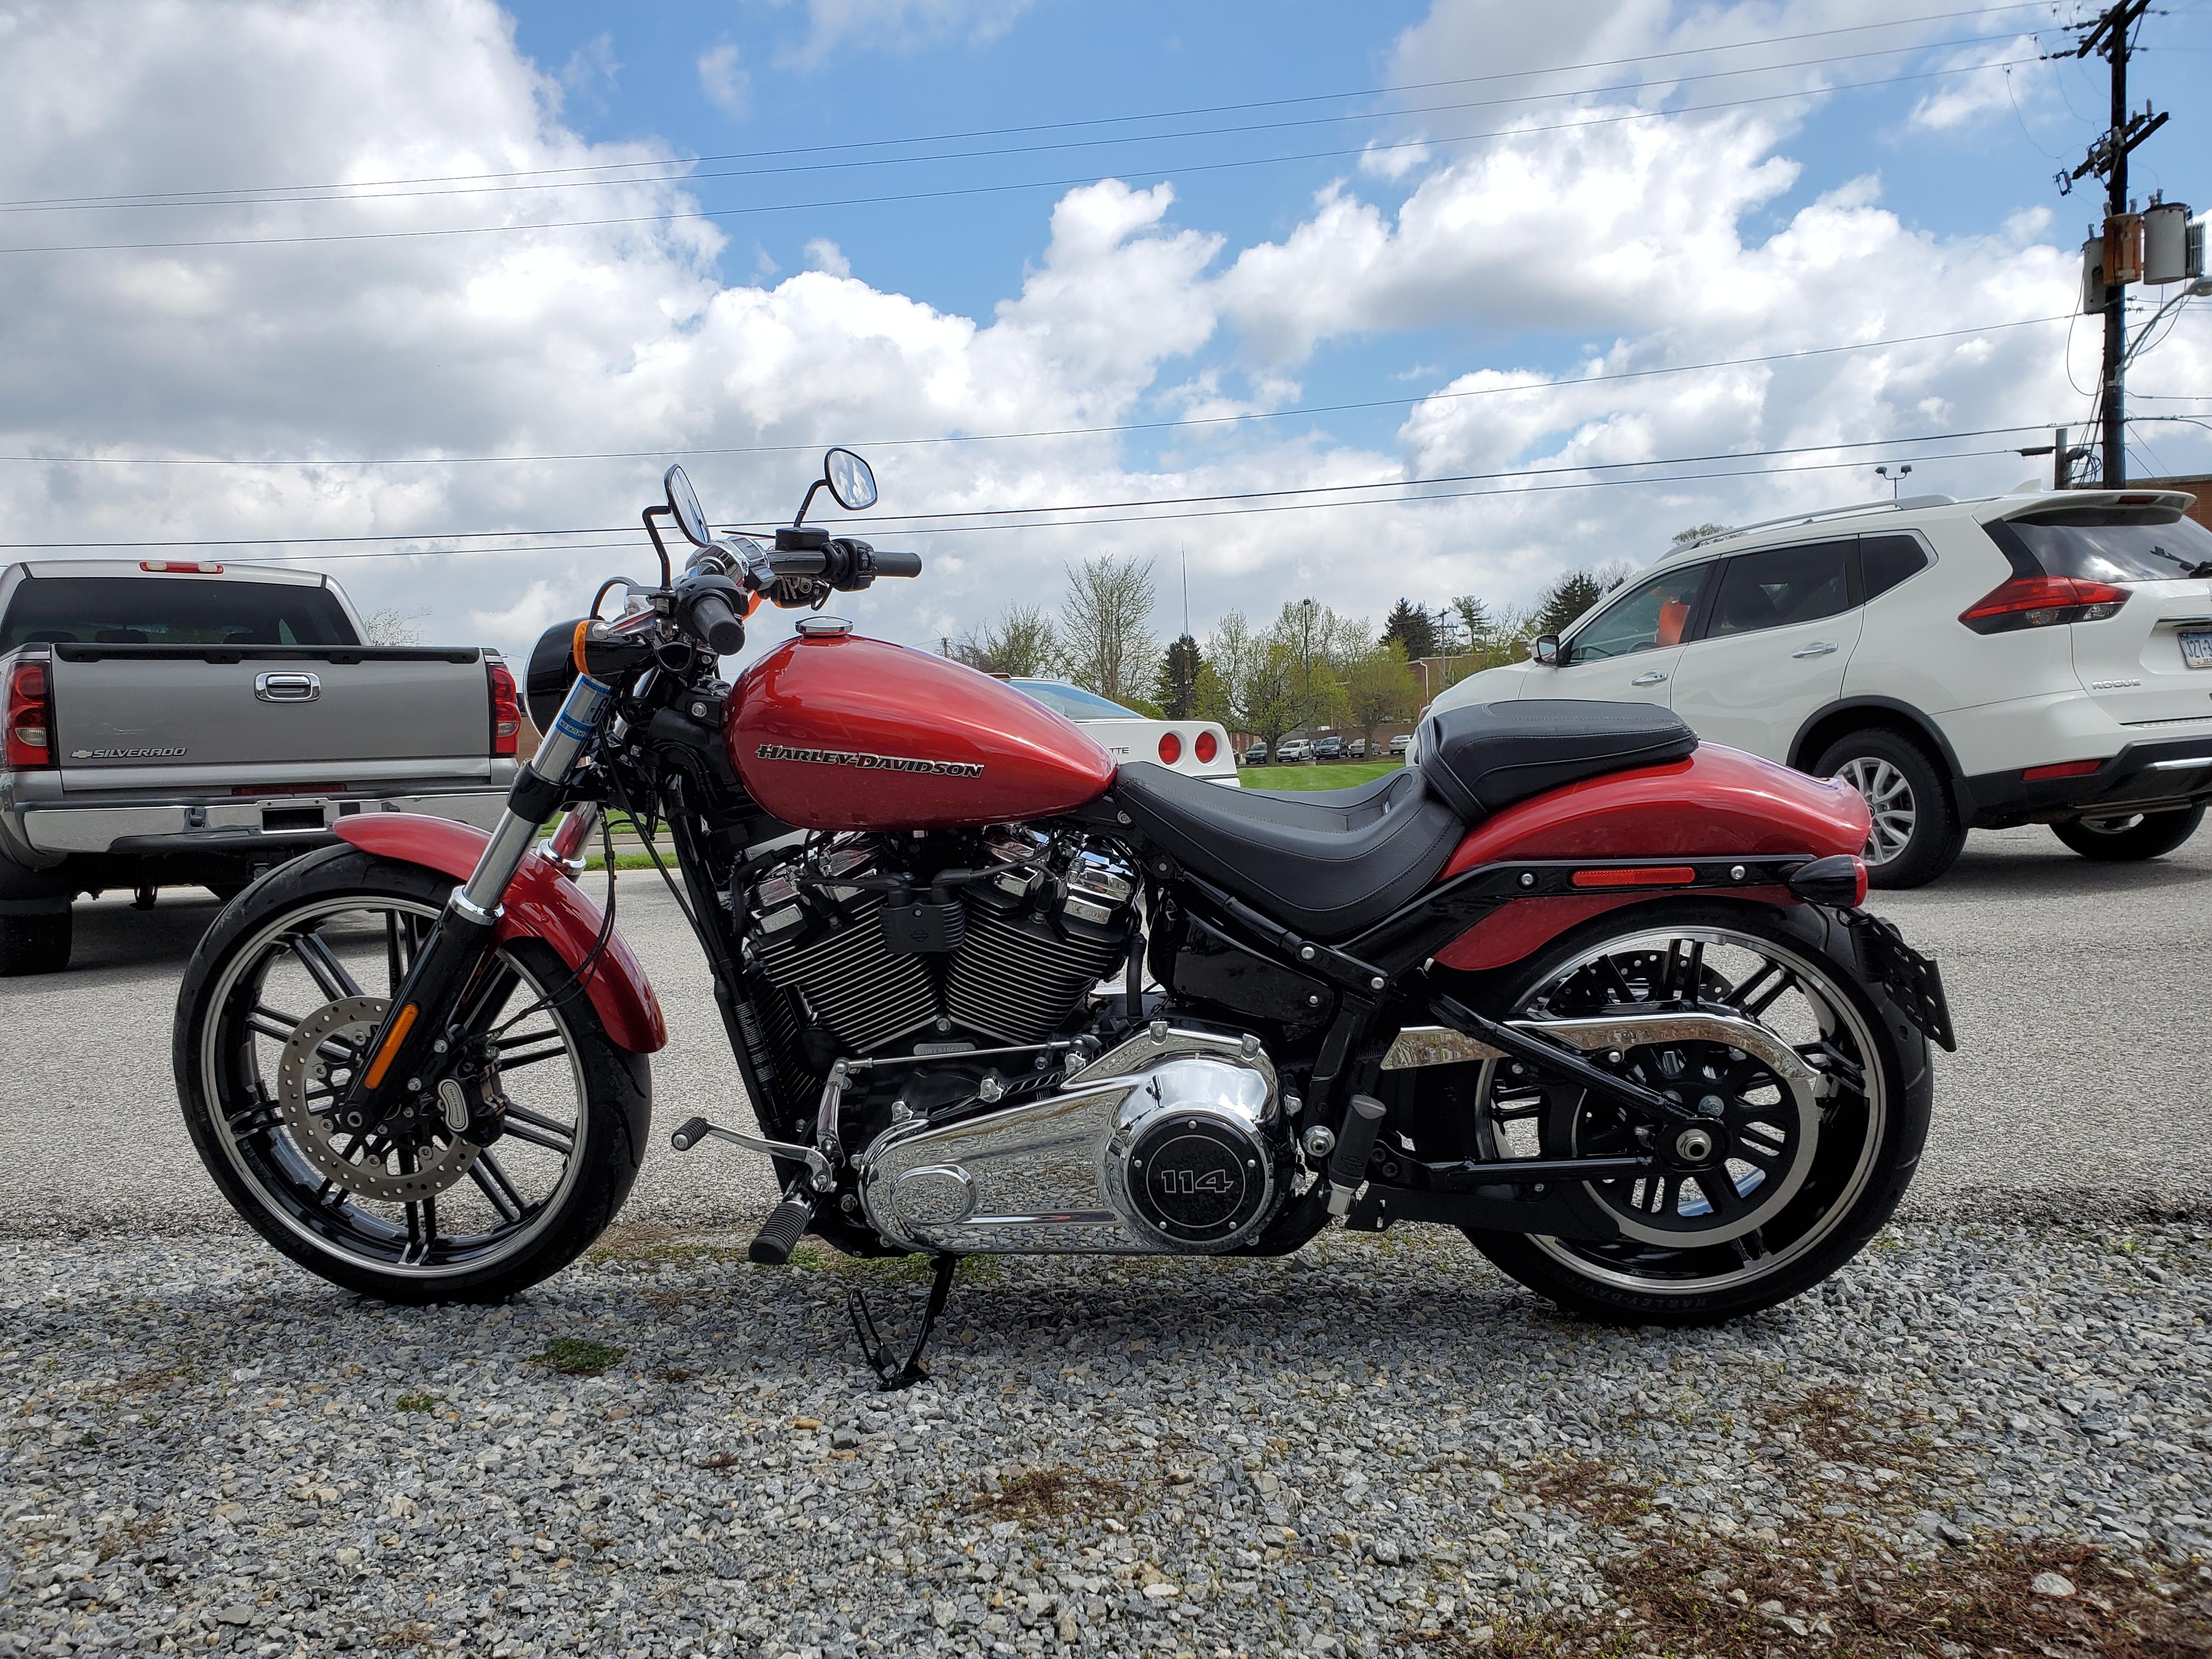 2008 Harley-Davidson® FLHX Street Glide® – $11900